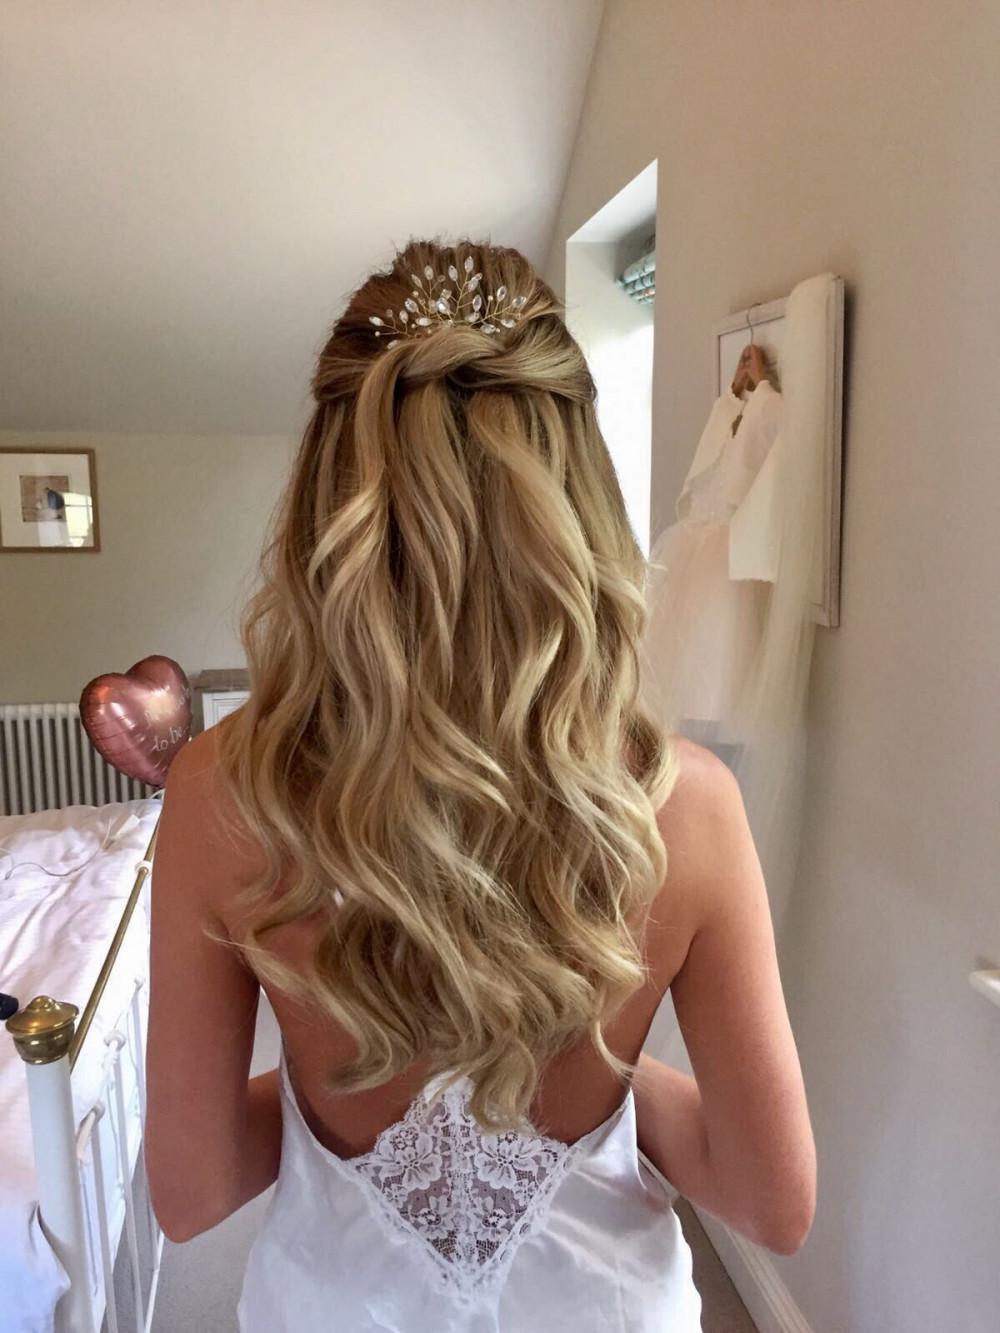 Half up half down hair for Hannah's wedding at Elmore Court x - Make Me Bridal Artist: BEYOU Weddings hair & makeup. #blonde #smoothwaves #halfuphair #halfuphalfdown #beautifulhair #downhair